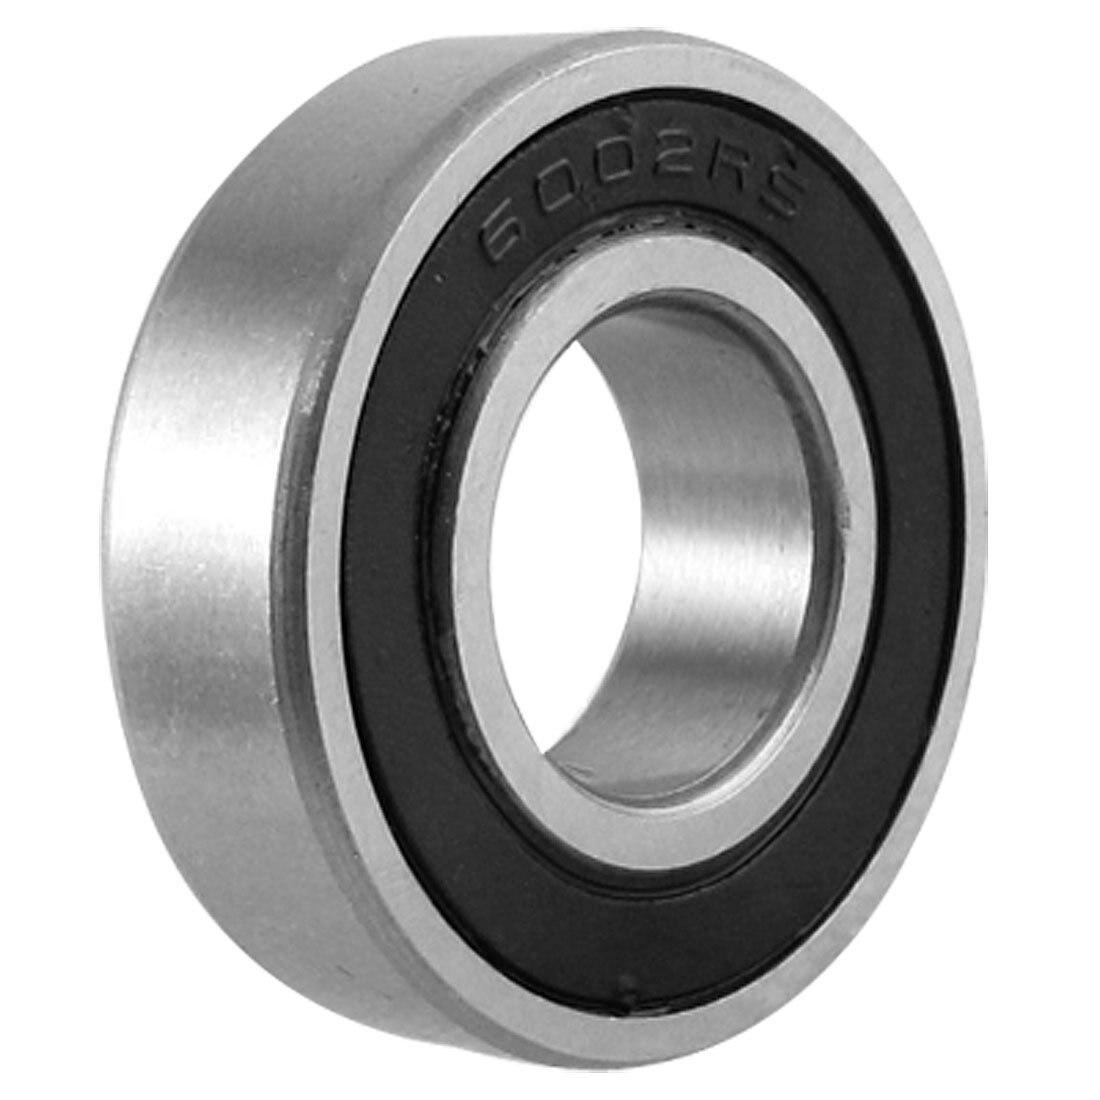 KSOL 15mm X 32mm X 9mm Width Single Row Deep Groove Sealed Radial Ball Bearing 6002RS